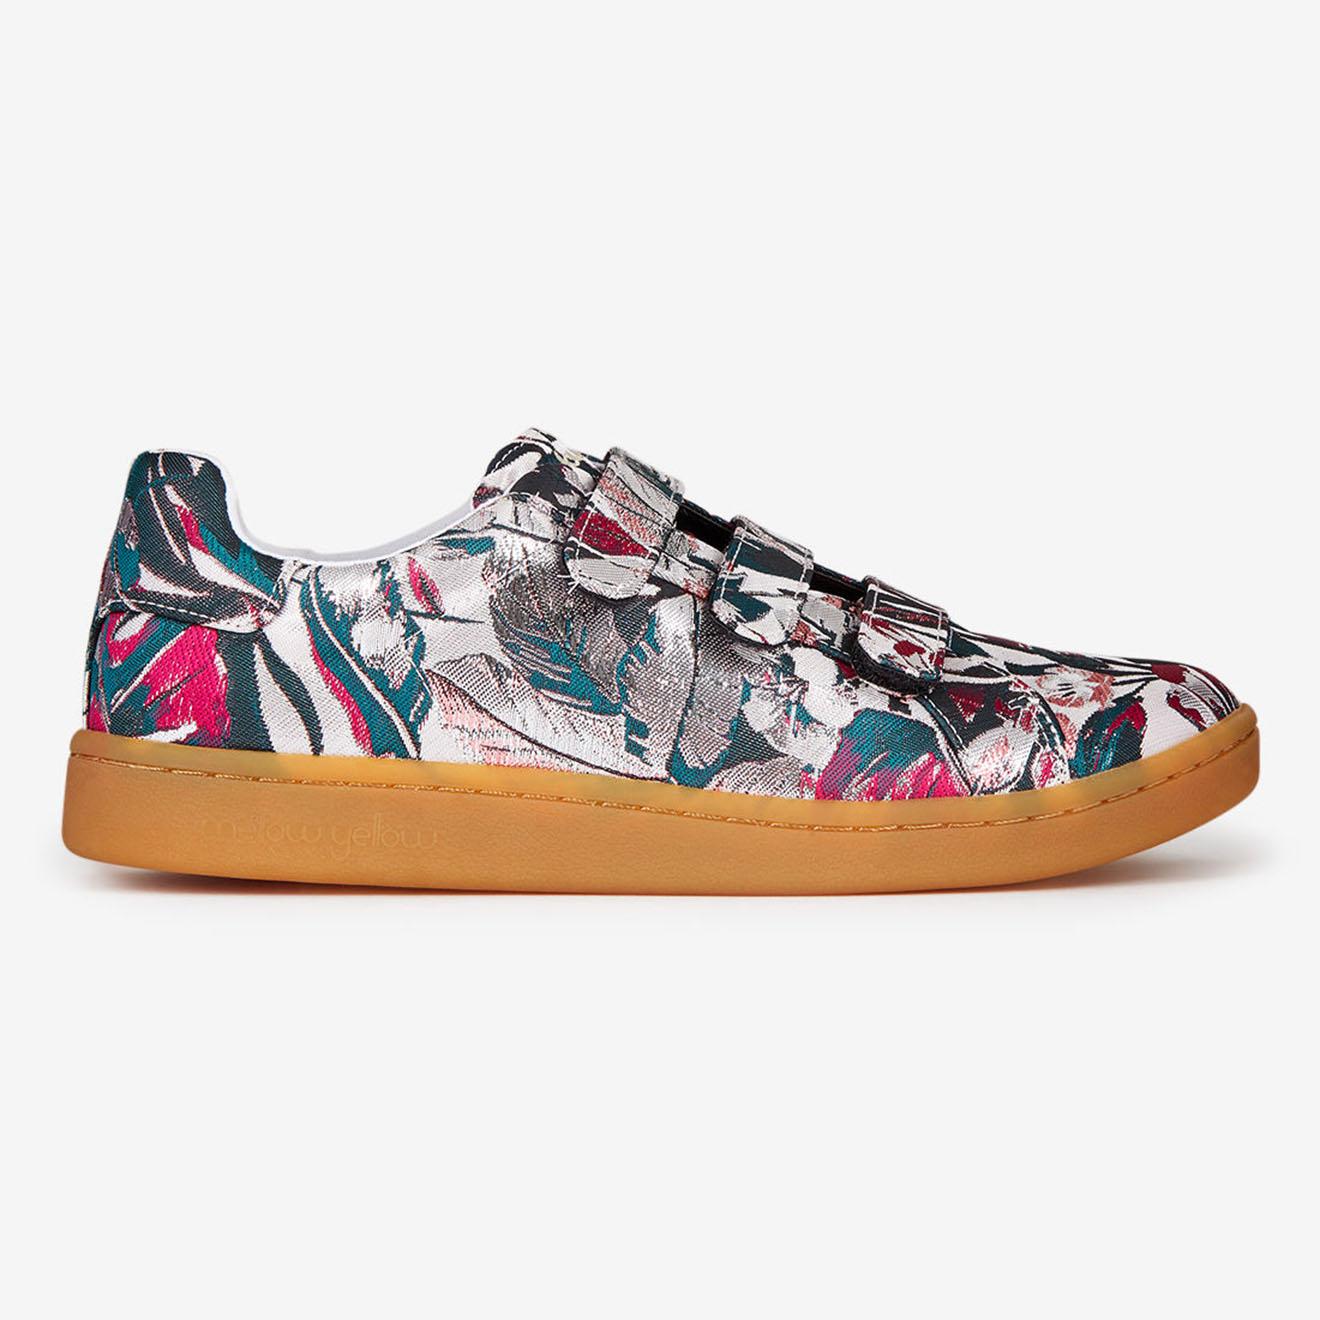 Sneakers Fatilde en Toile rose/vert - Mellow Yellow - Modalova